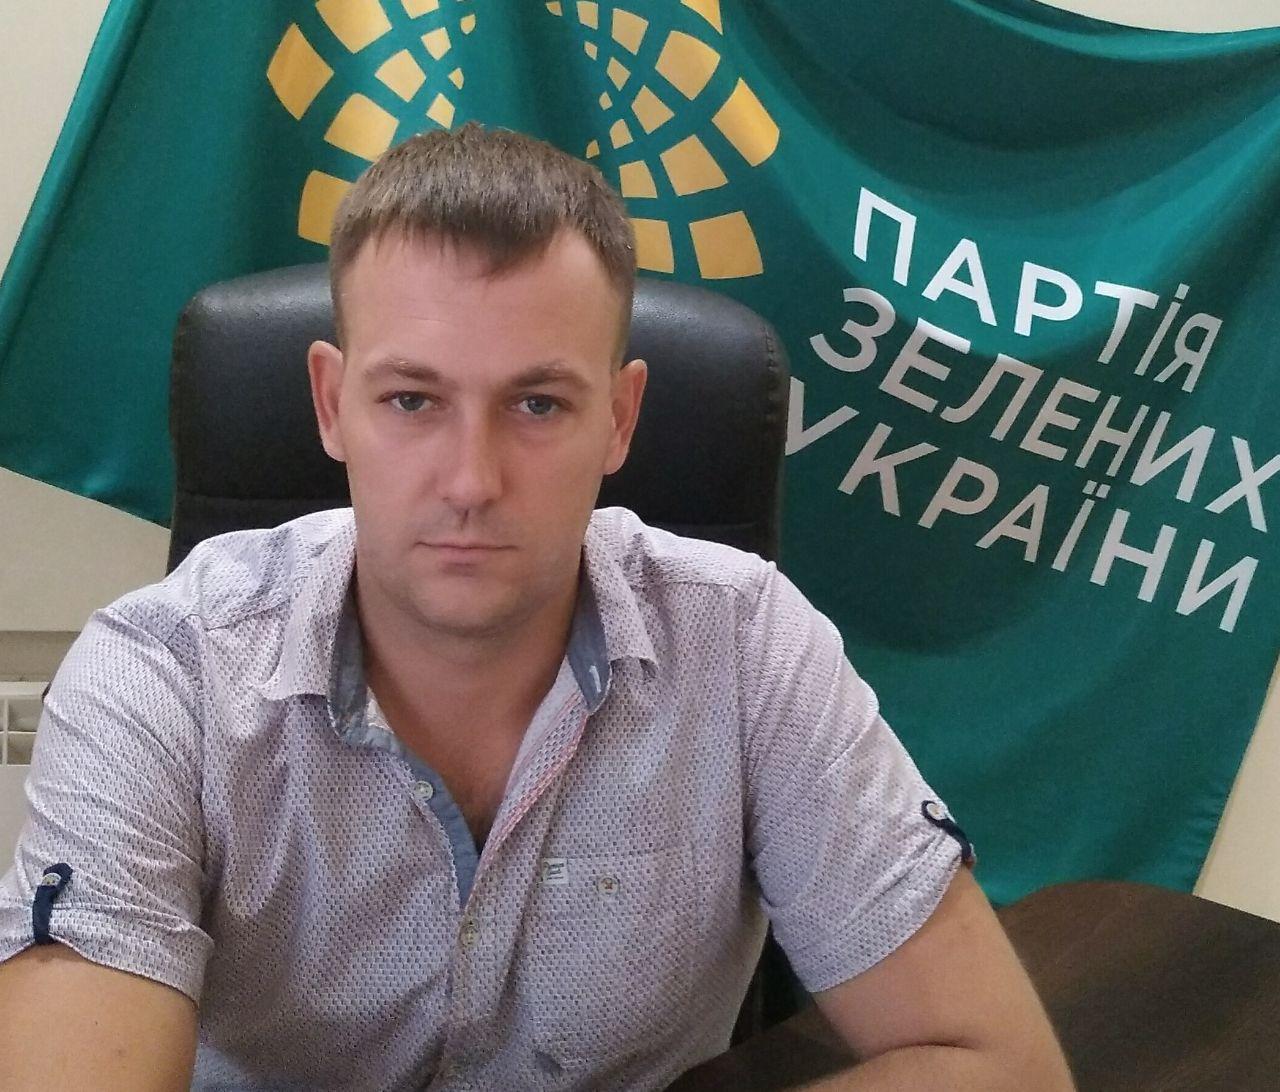 Буркот Дмитро Валерійович